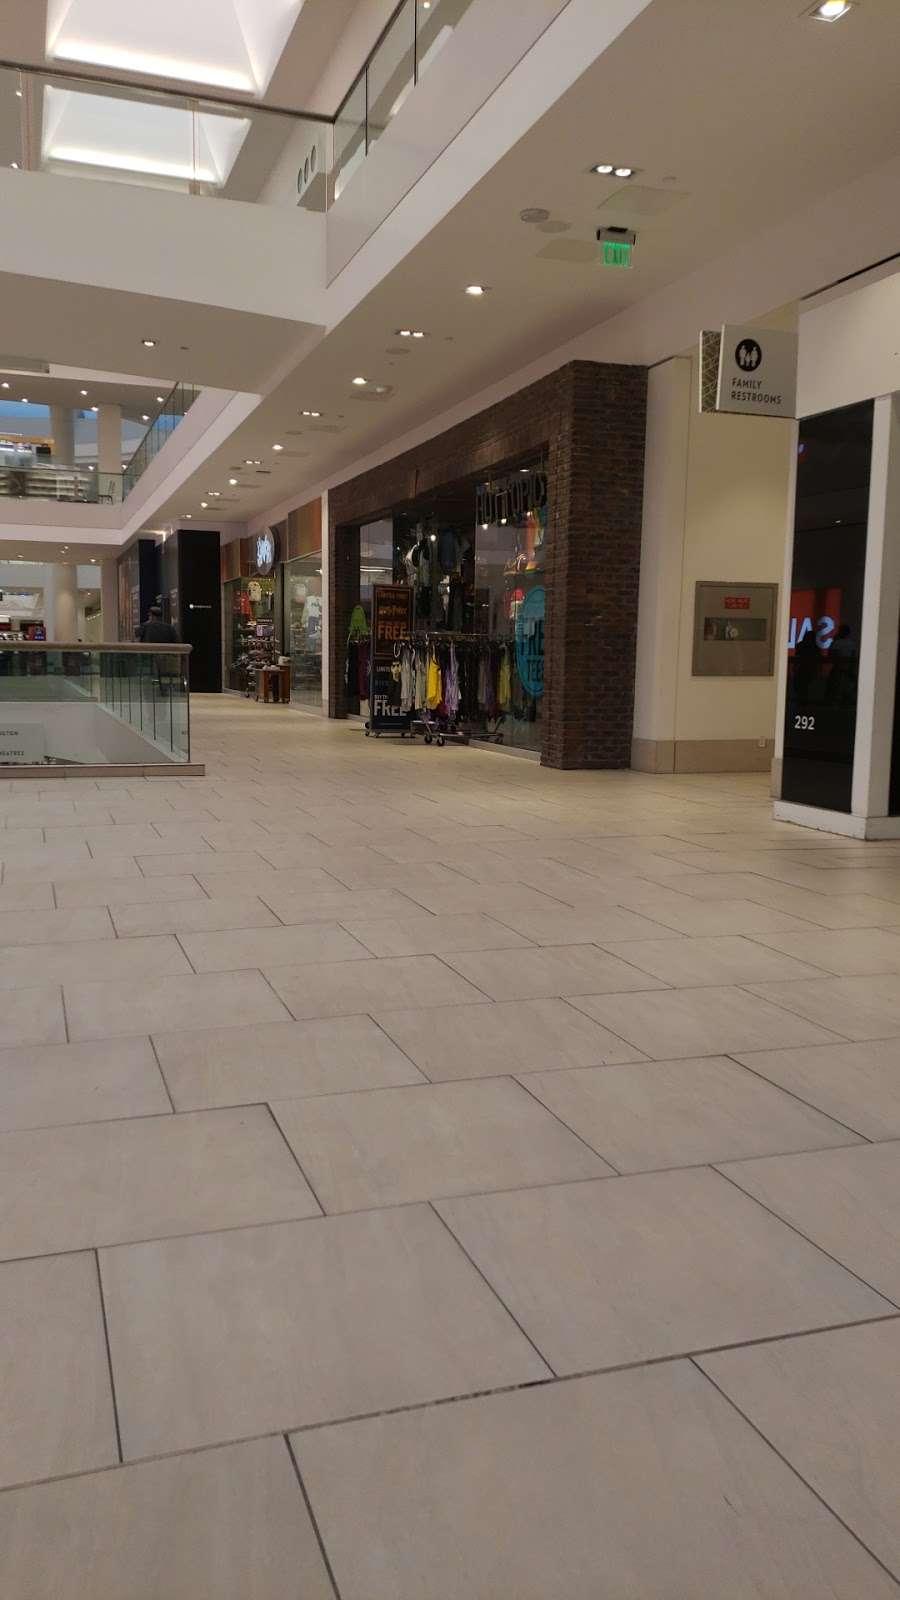 Hot Topic - clothing store  | Photo 6 of 10 | Address: 201 E Magnolia Blvd #290, Burbank, CA 91501, USA | Phone: (818) 843-8630